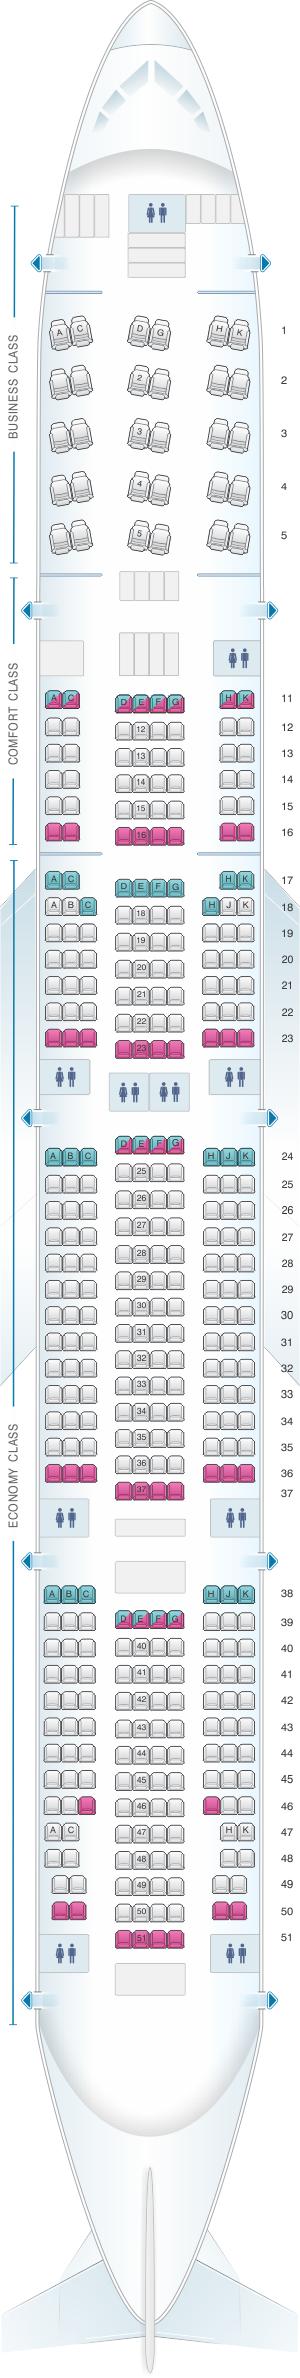 Seat Map Aeroflot Russian Airlines Boeing B777 300er Seatmaestro